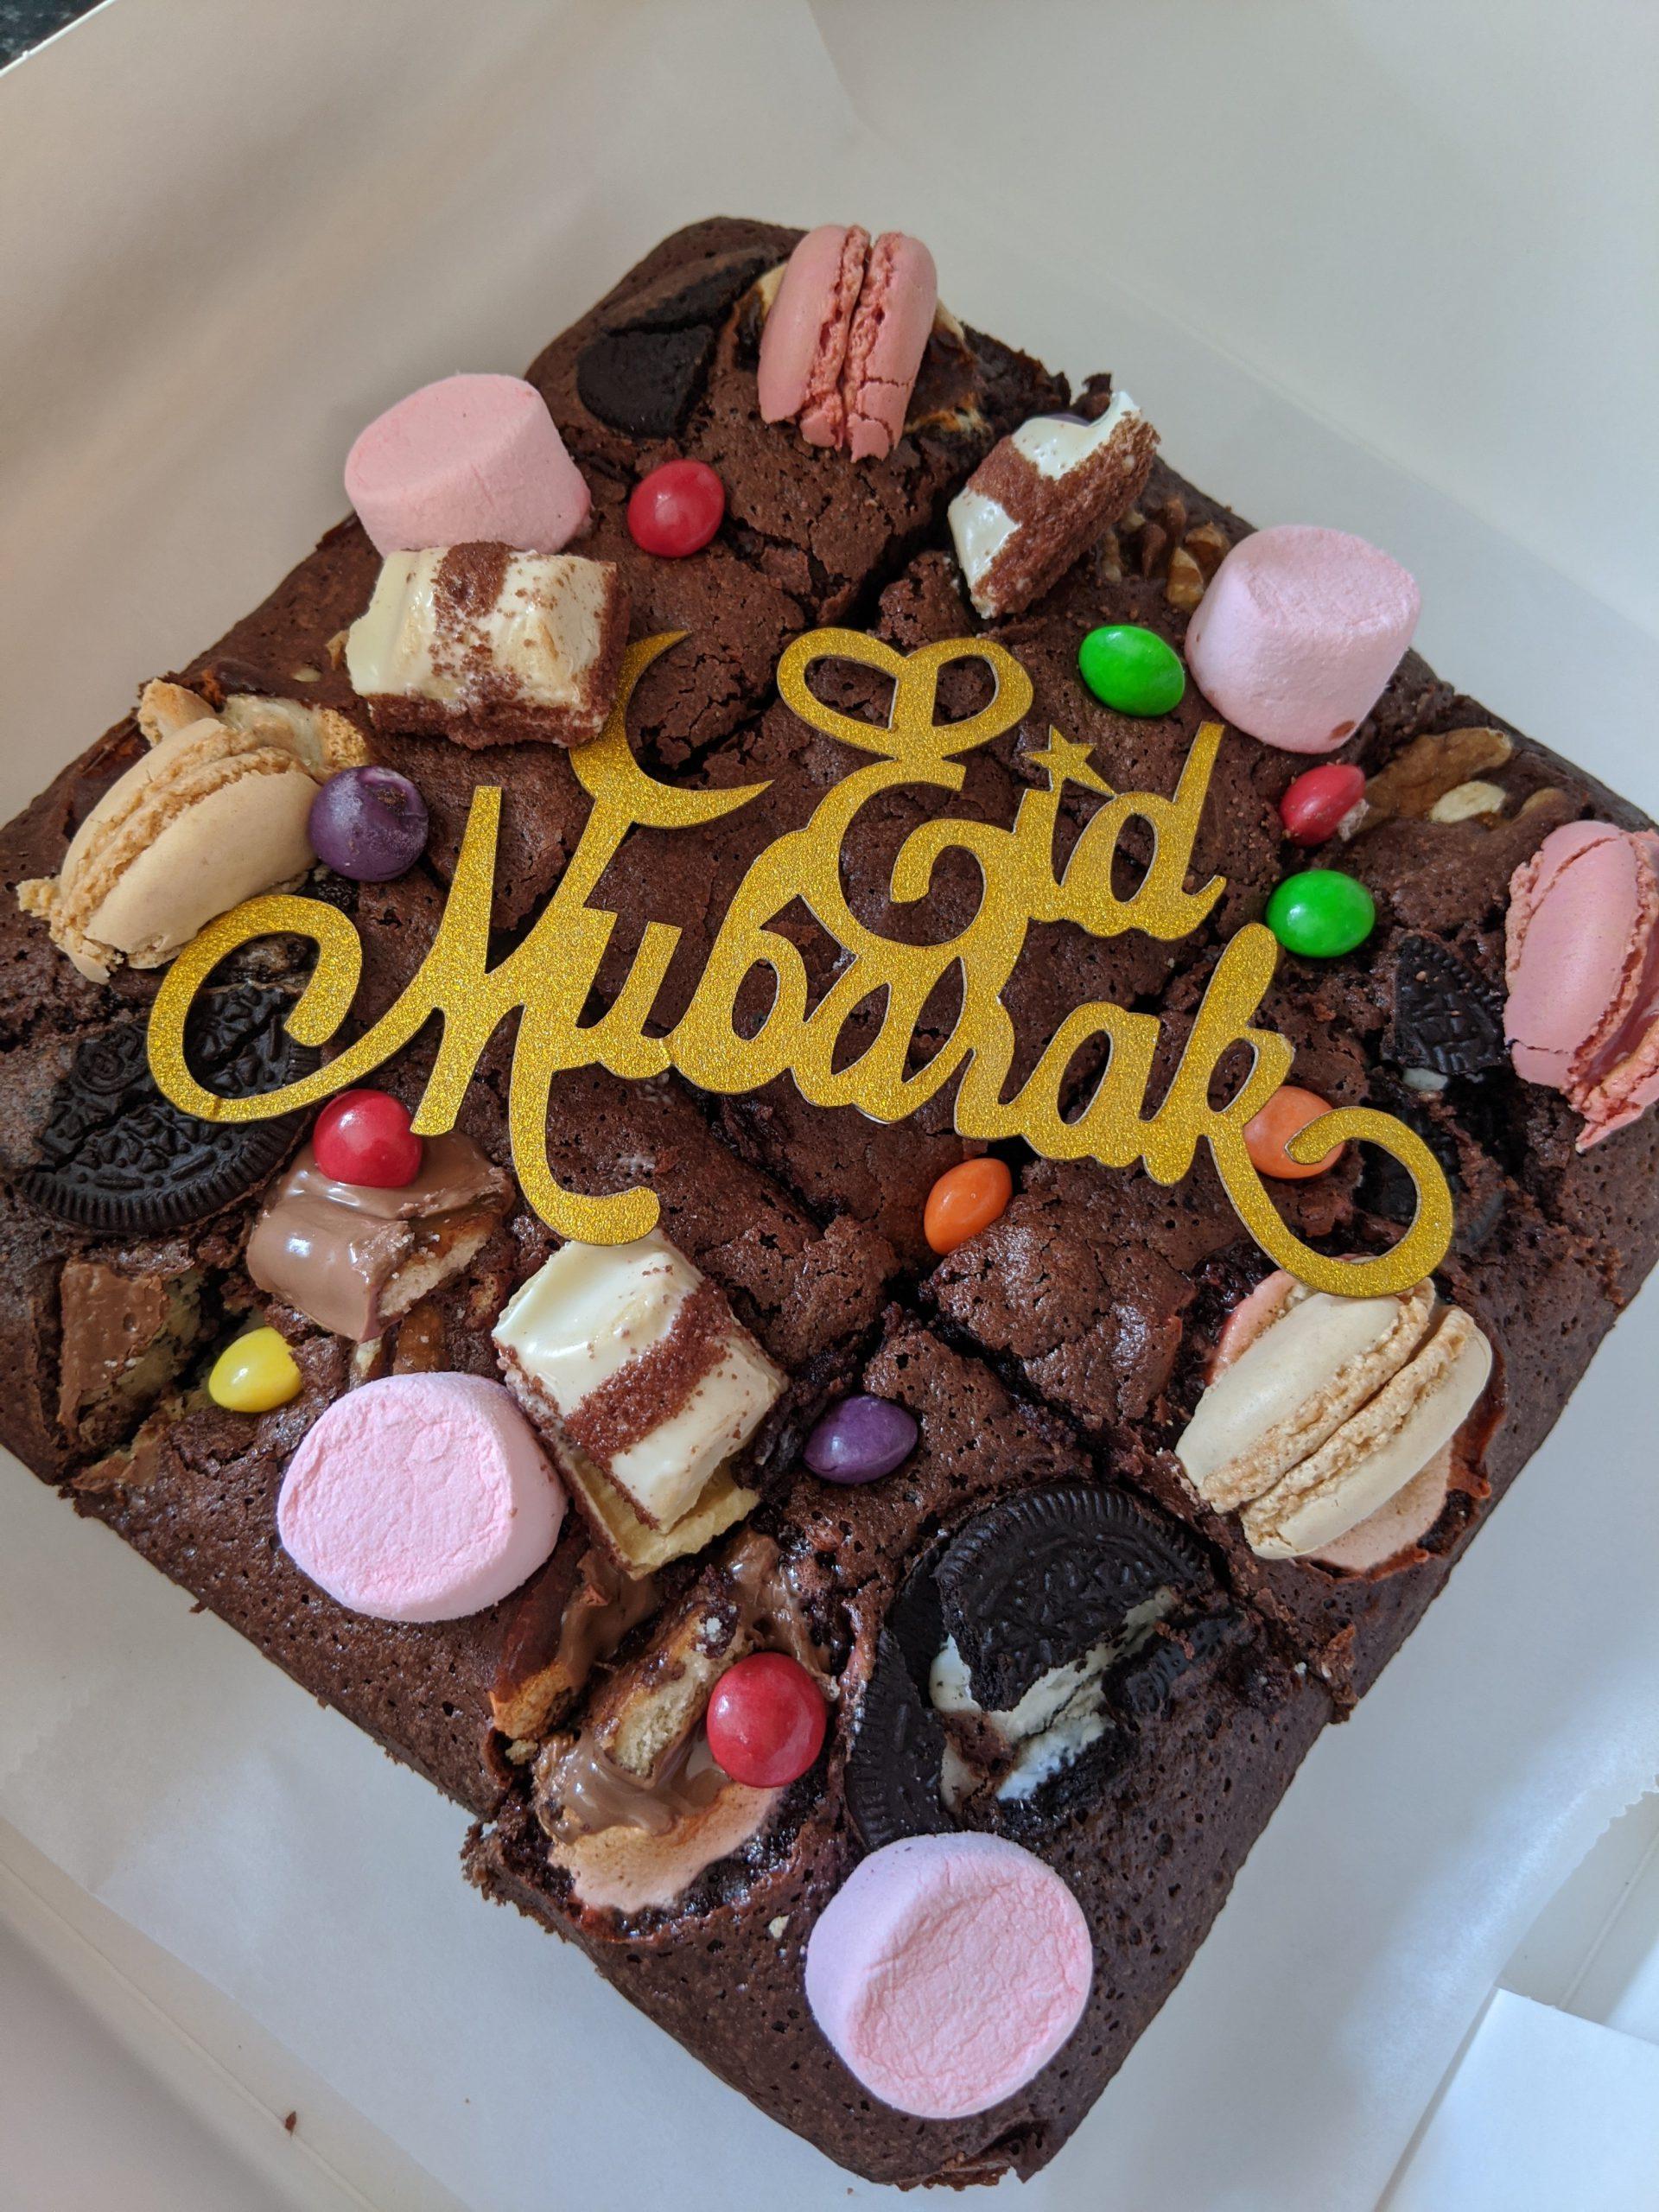 Gooey Chocolate Brownies….